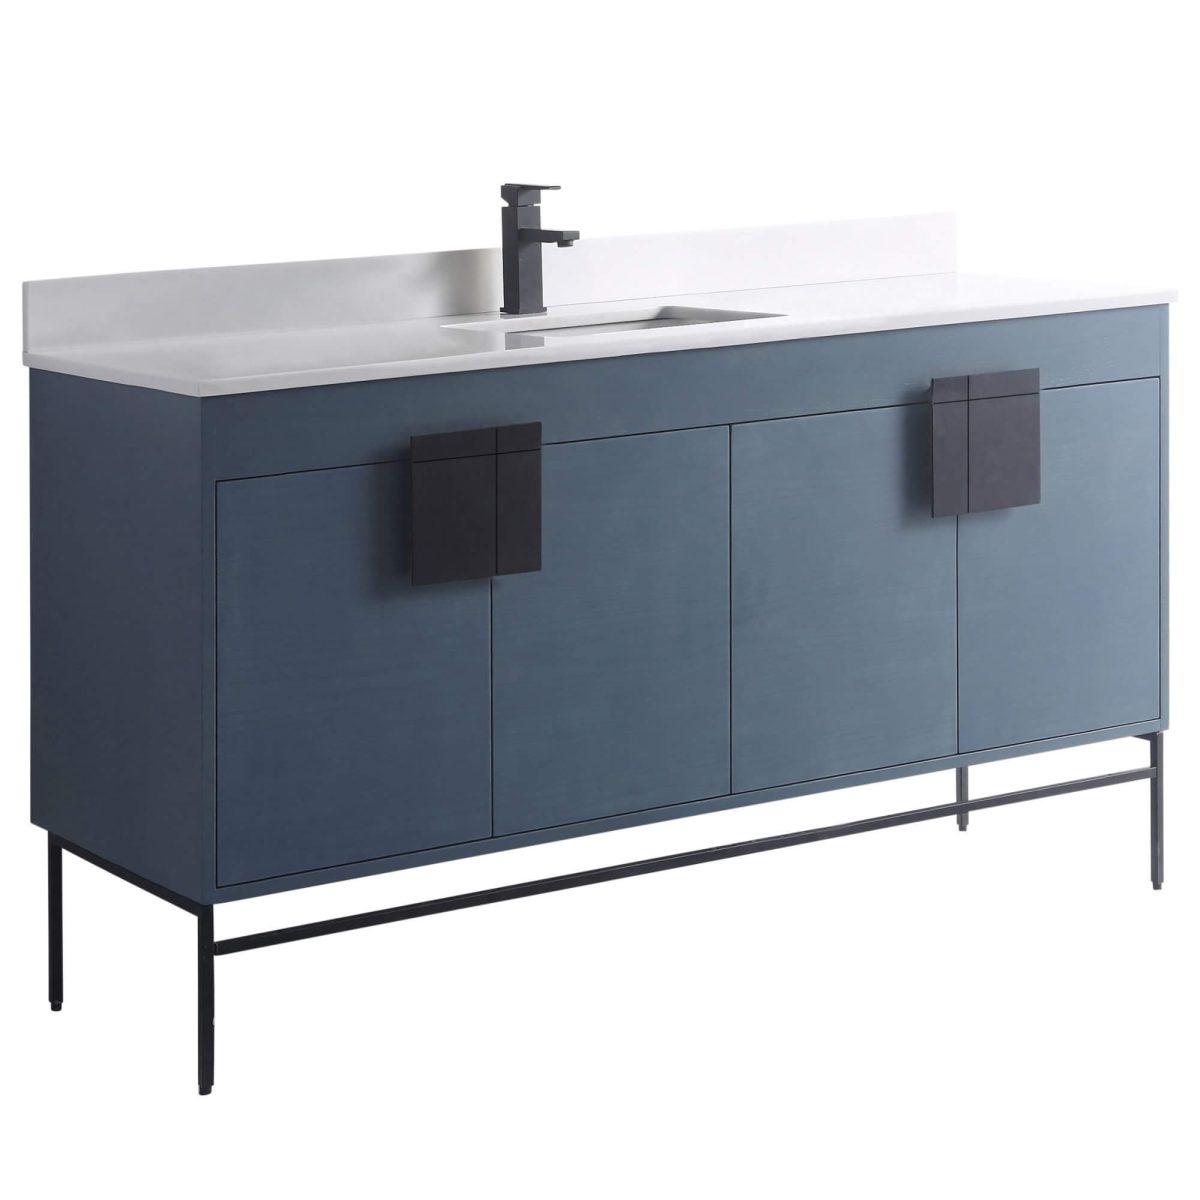 "Shawbridge 60"" Modern Single Bathroom Vanity  French Blue with Black Hardware"